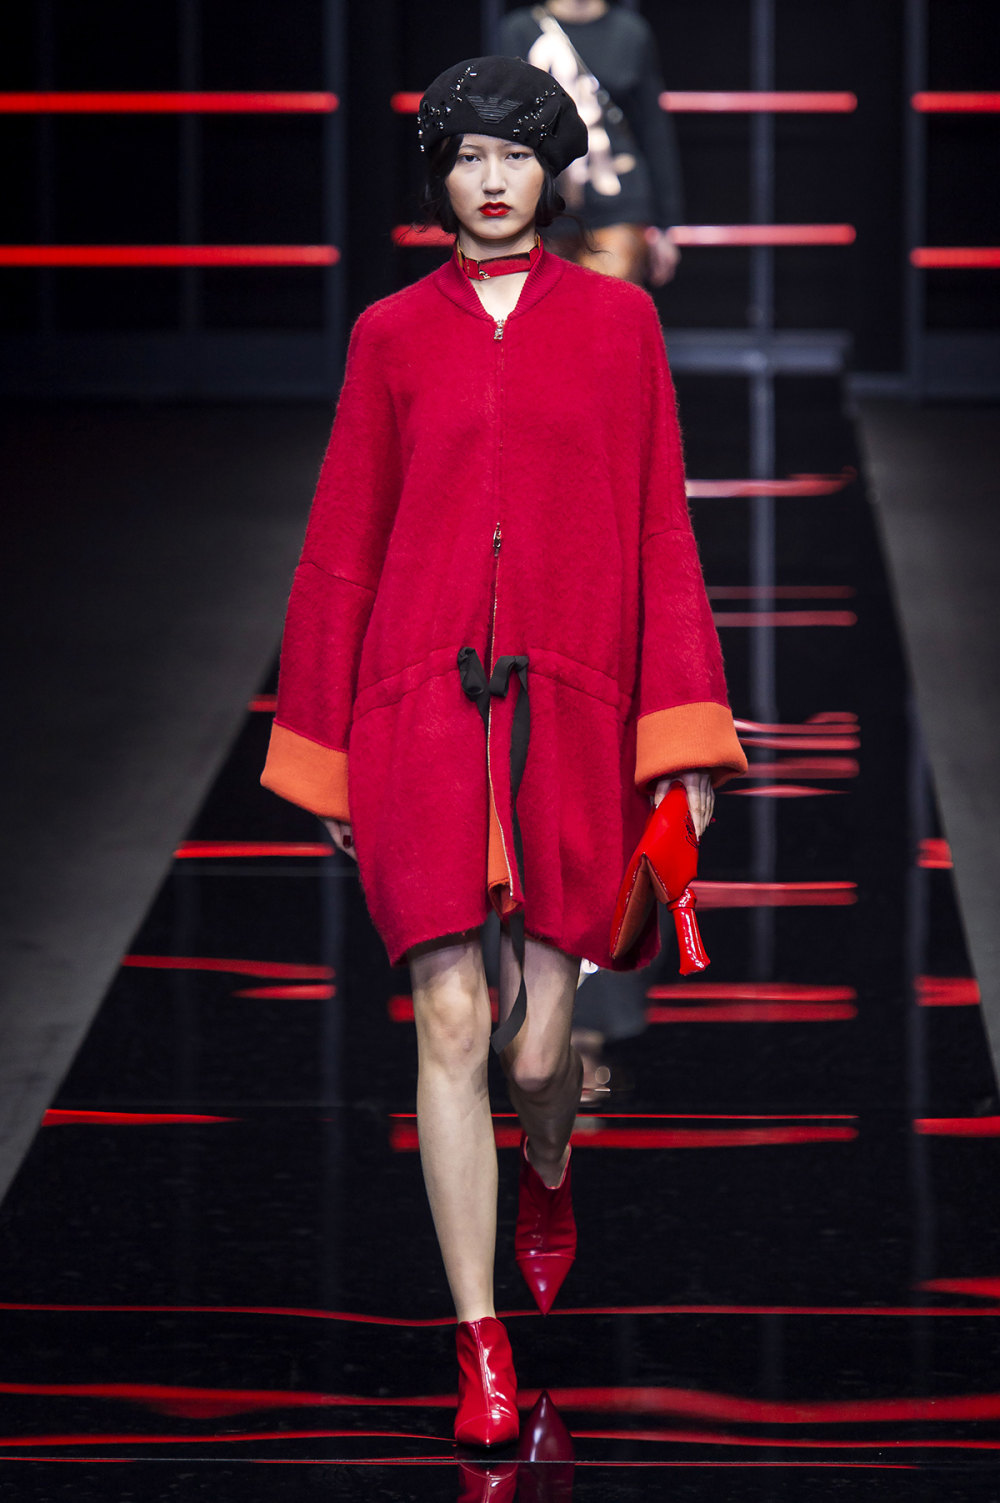 Emporio Armani时装系列畅的裤子带有柔滑裙子的鸡尾酒礼服-8.jpg